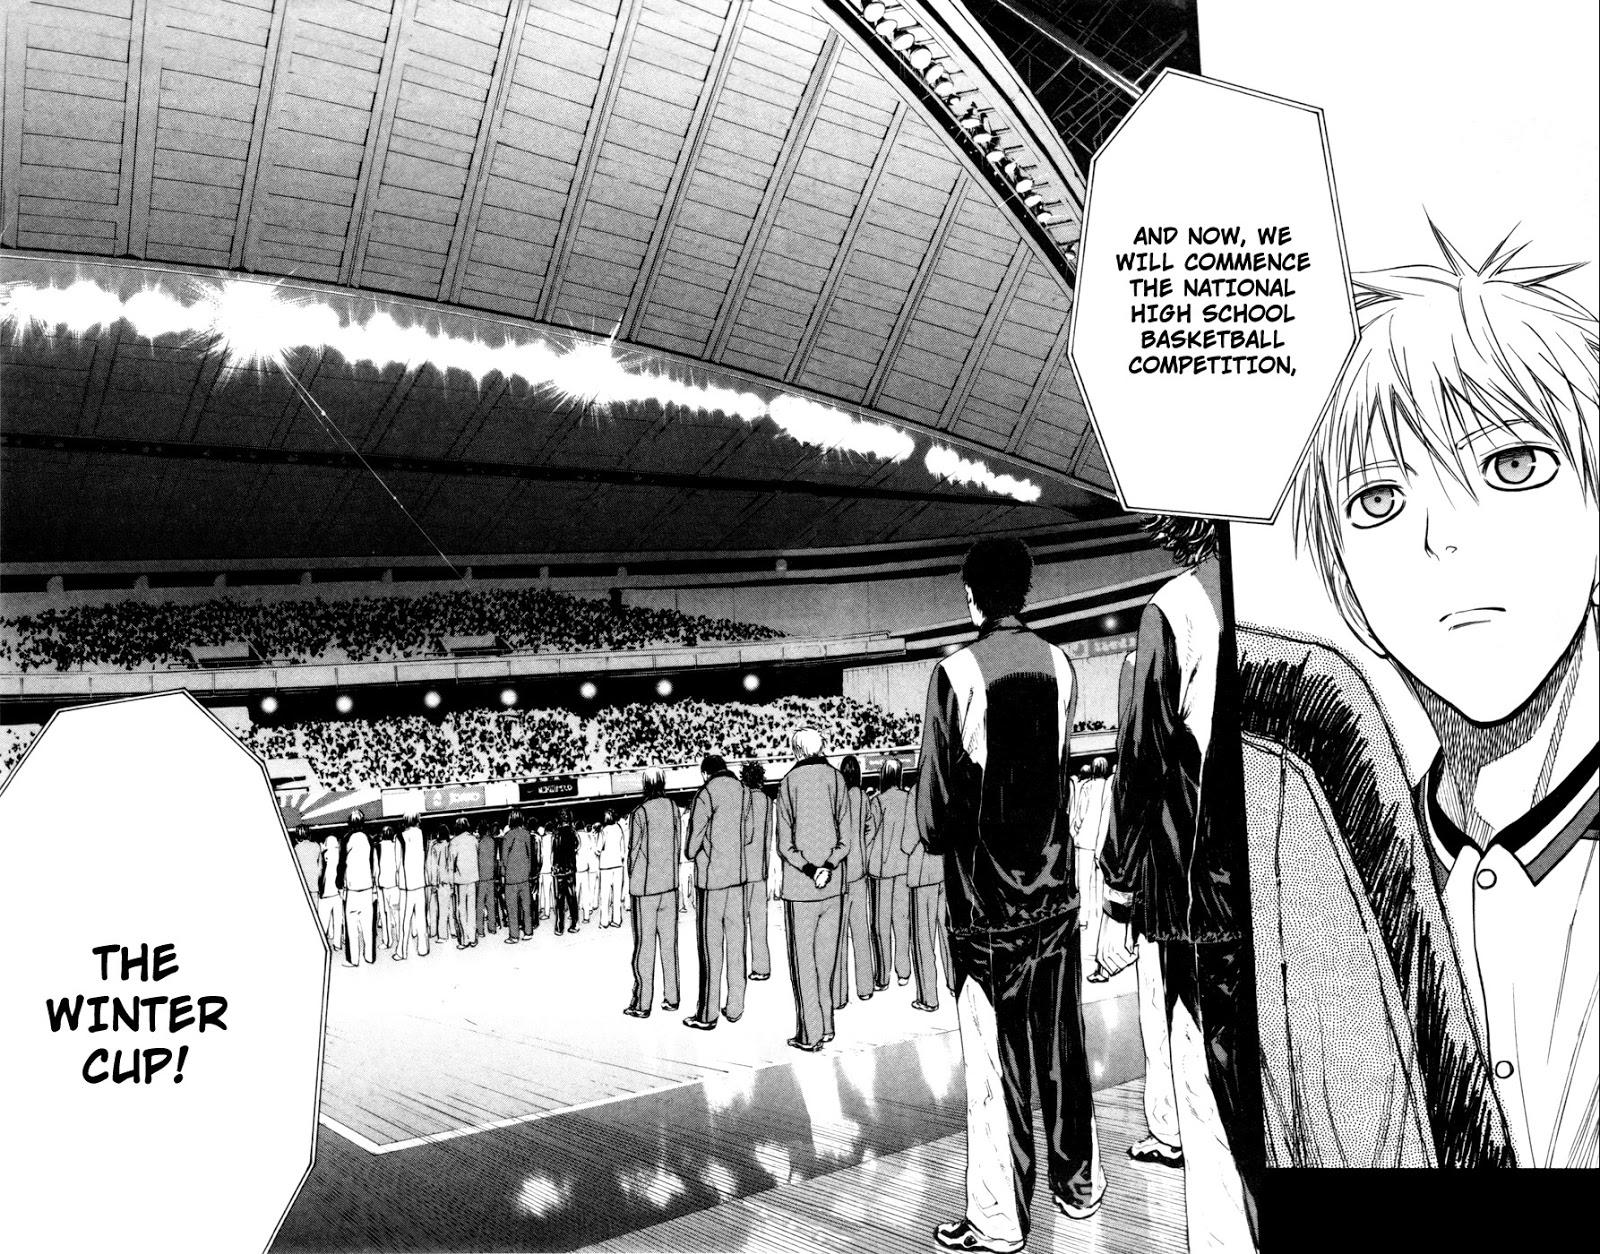 Kuroko no Basket Manga Chapter 112 - Image 18-19